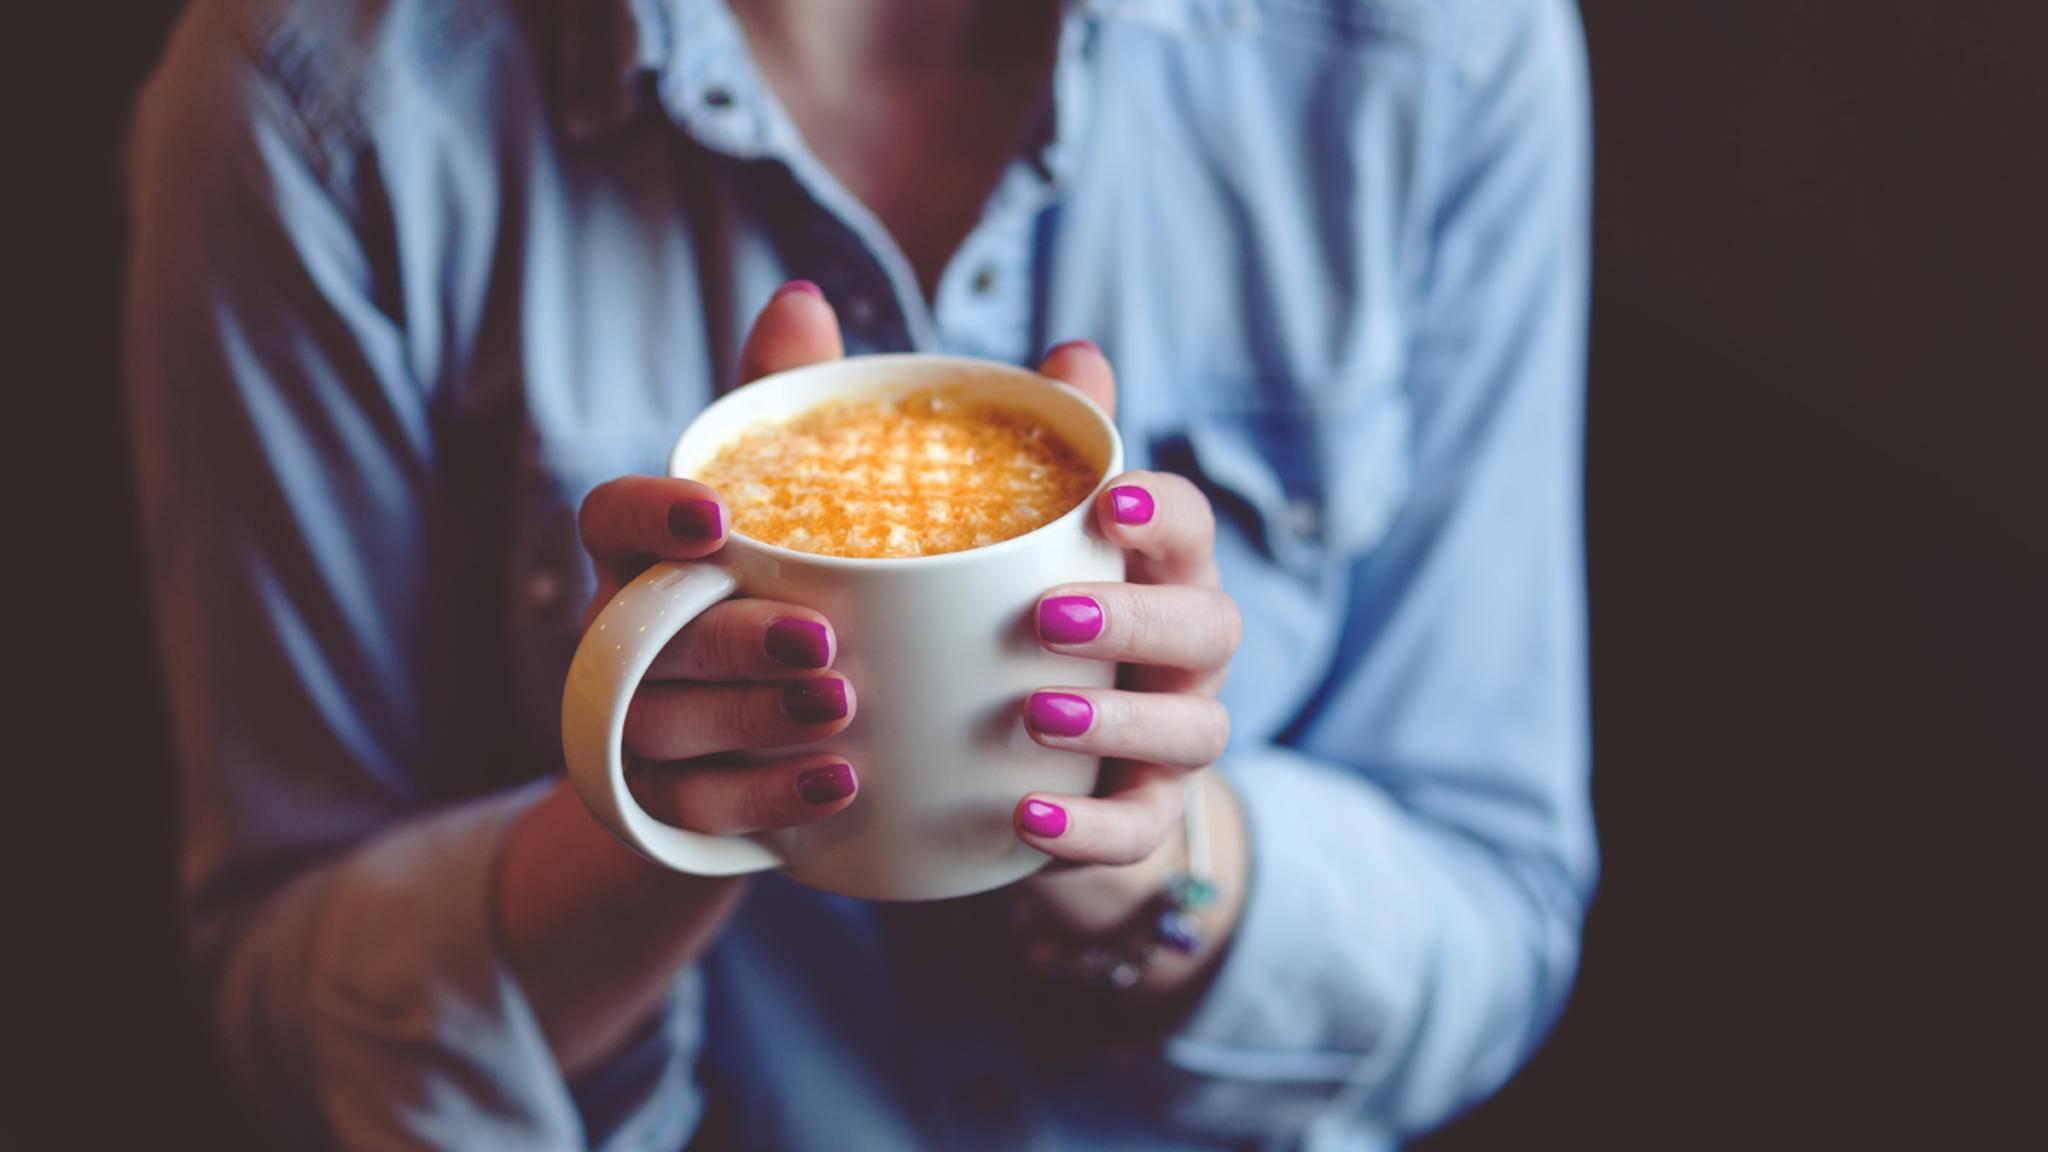 Kaffee mal anders: 7 Selfmade-Getränke auf Espresso-Basis